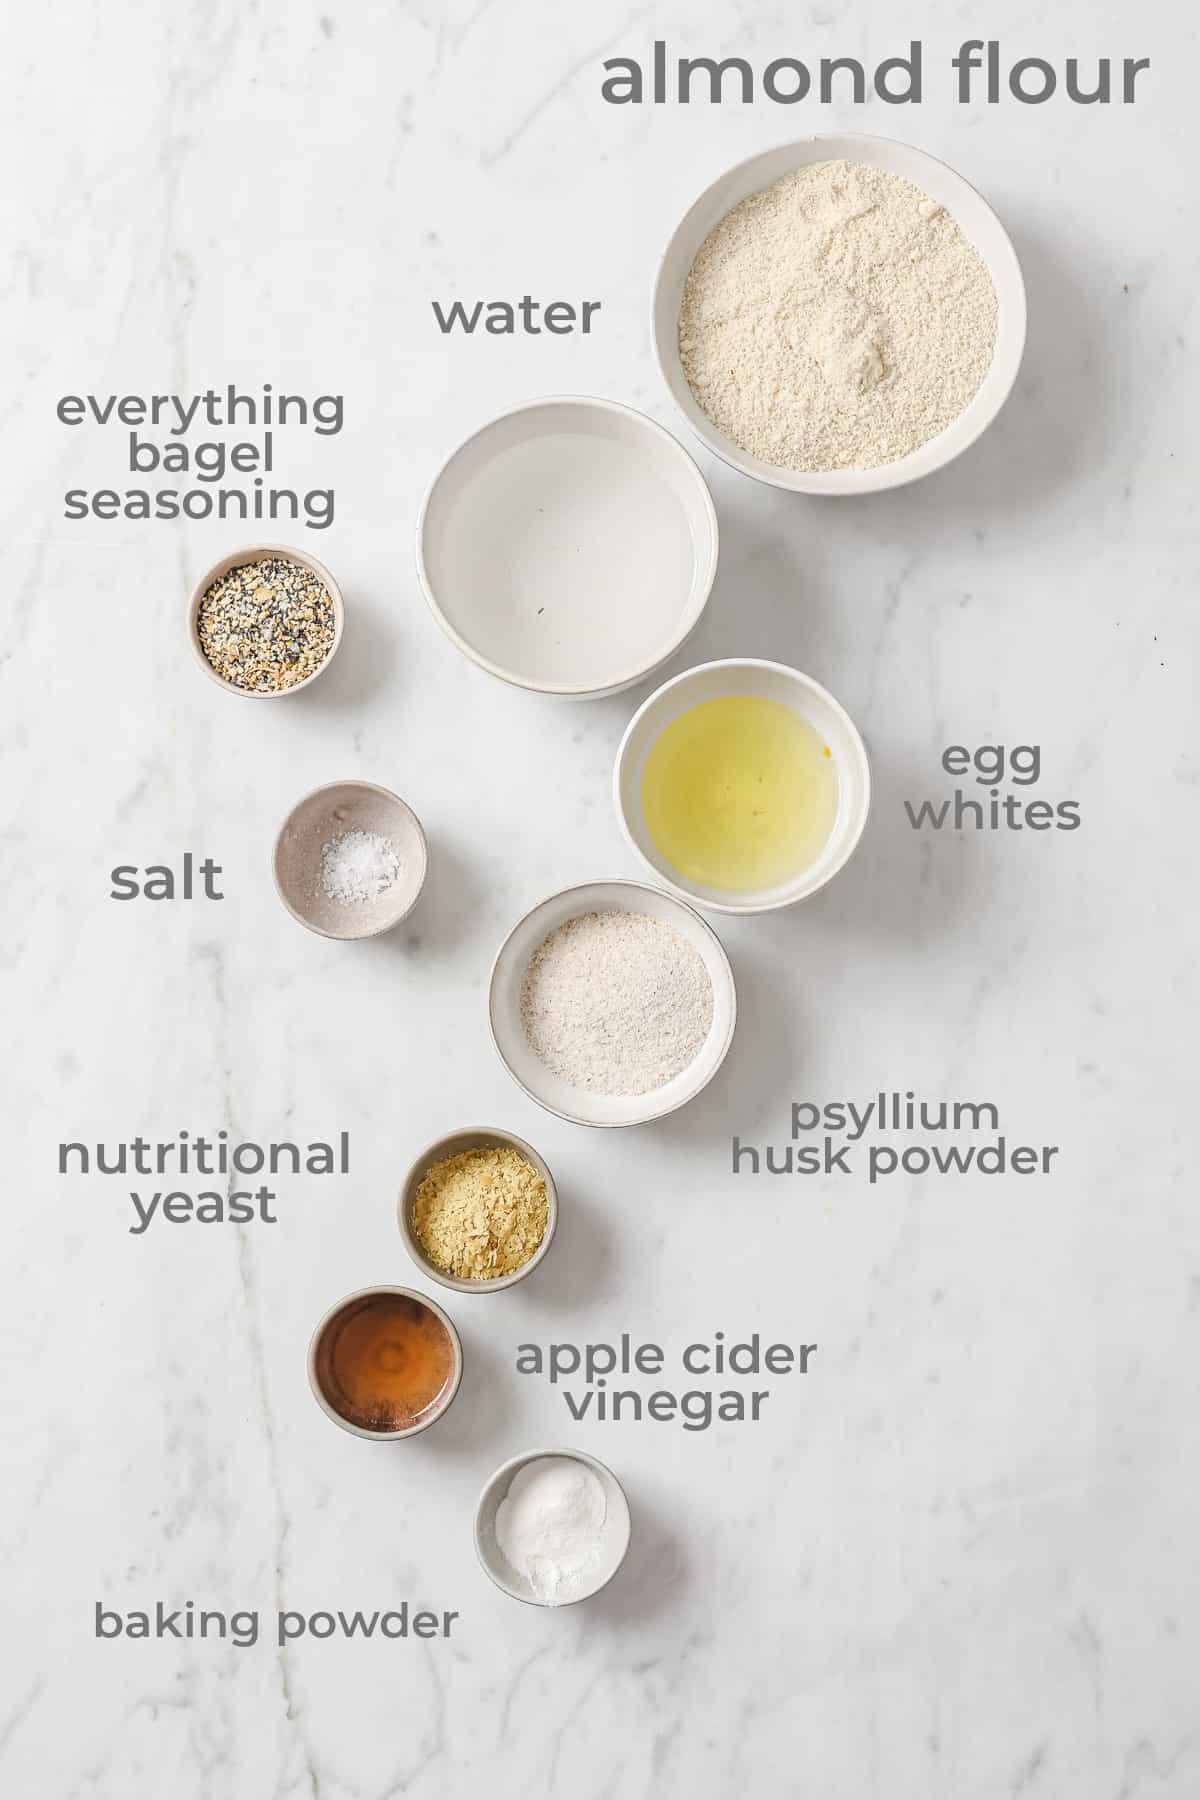 Ingredients for keto bread - almond flour, psyllium husk powder, eggs, bagel seasoning, nutritional yeast, baking soda